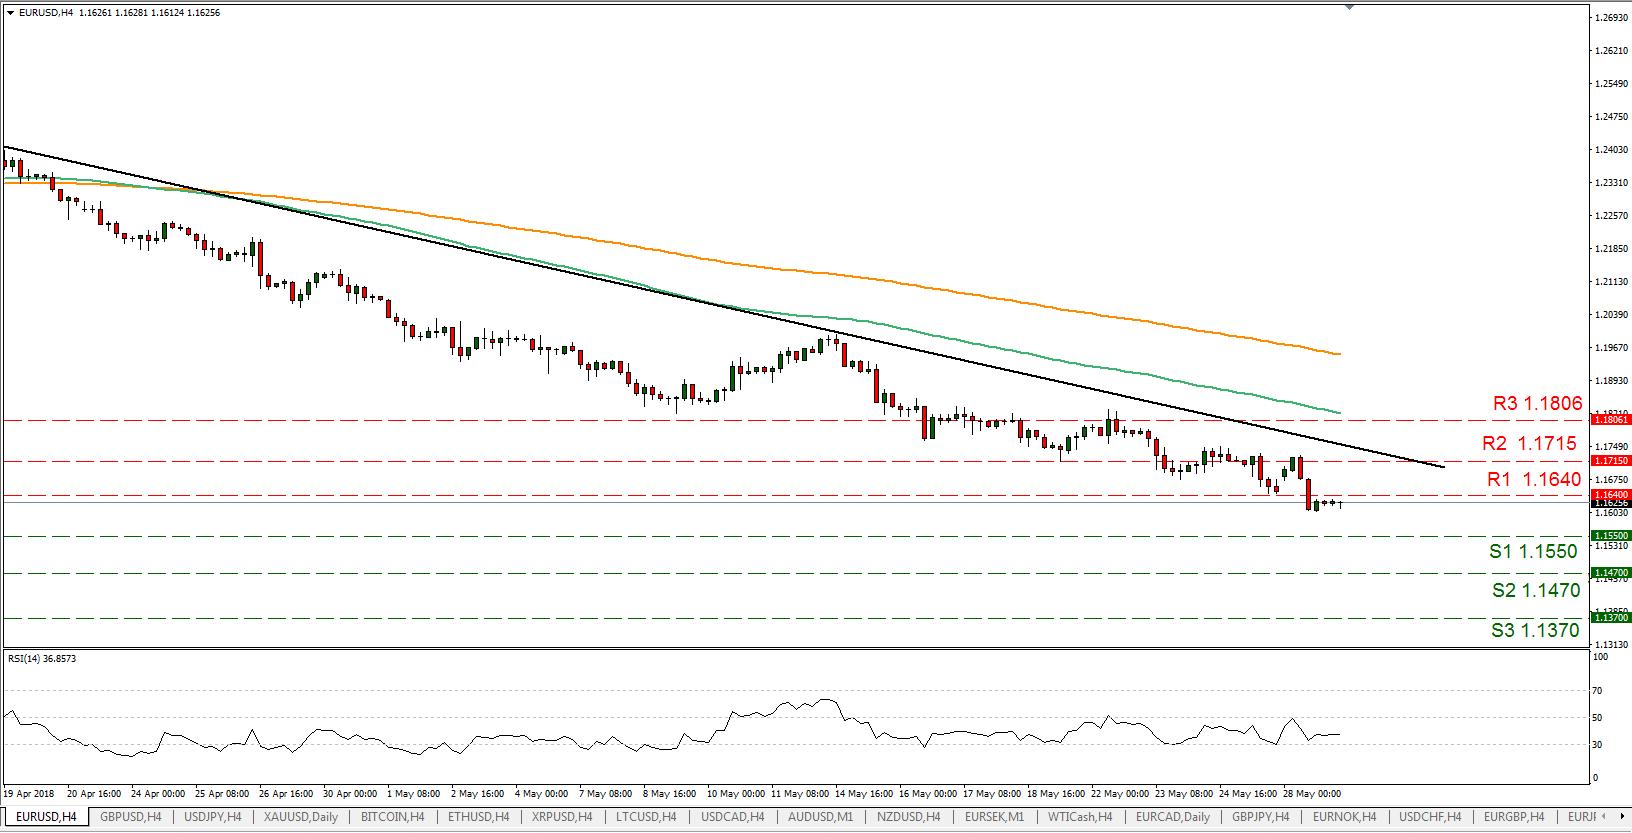 EUR/USD 29/05/2018 | EconAlerts